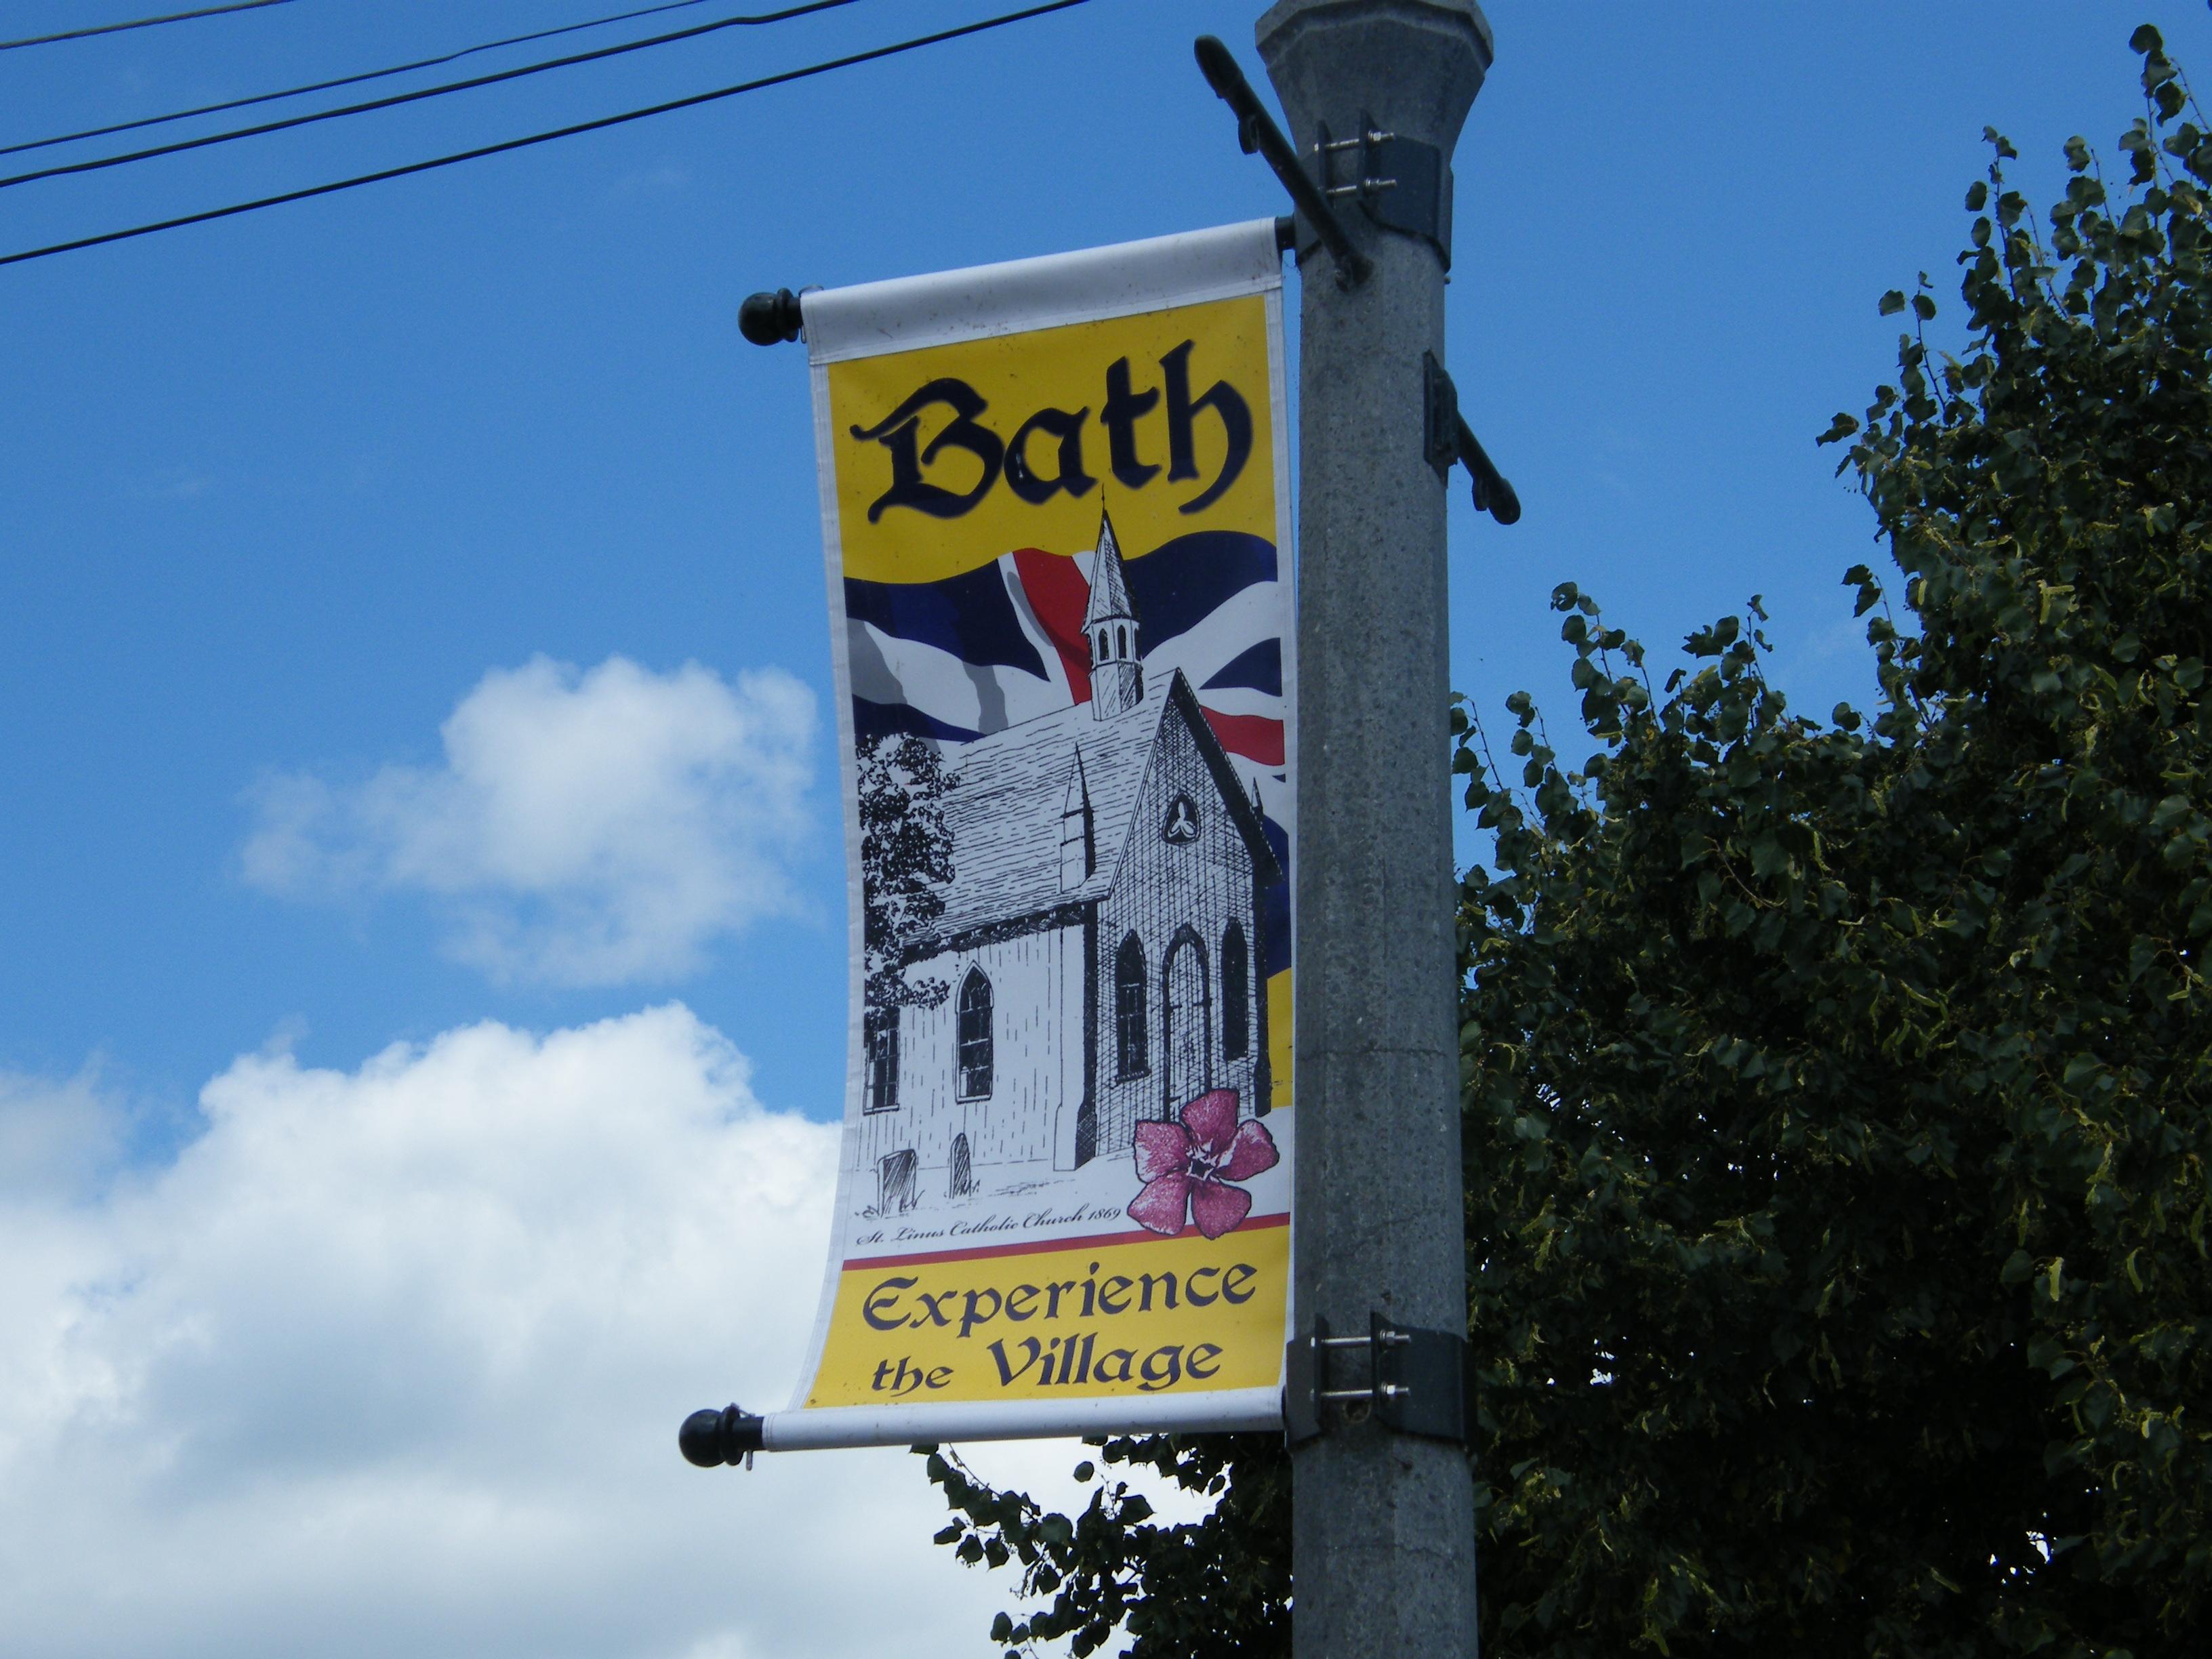 Village of Bath street banners